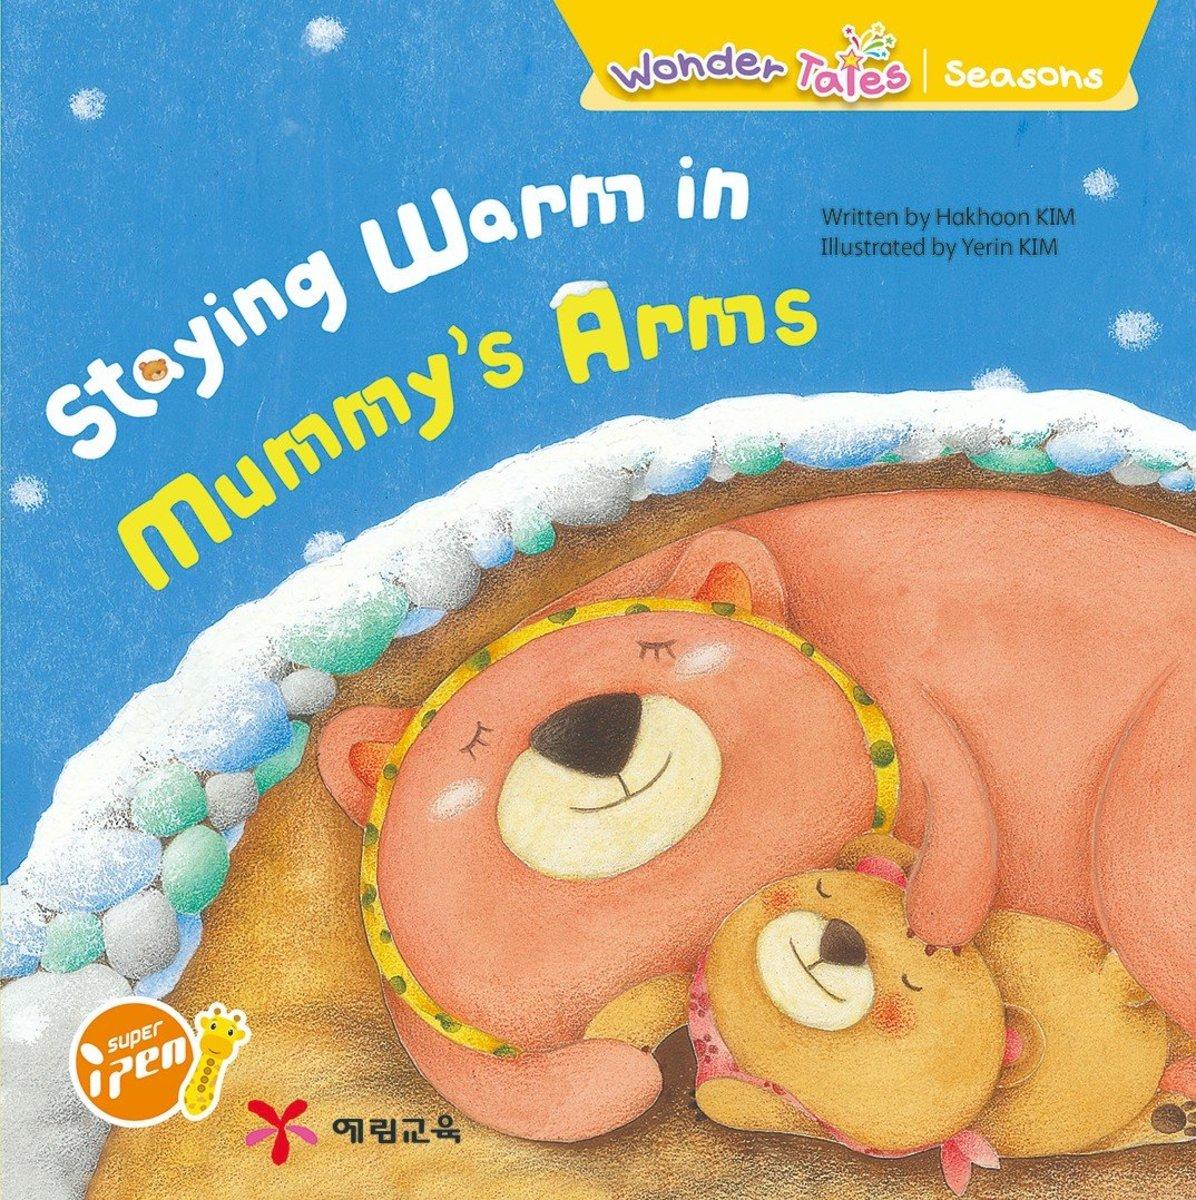 Wonder Tales 英文繪本 (K2)—Staying warm in mummy's arms